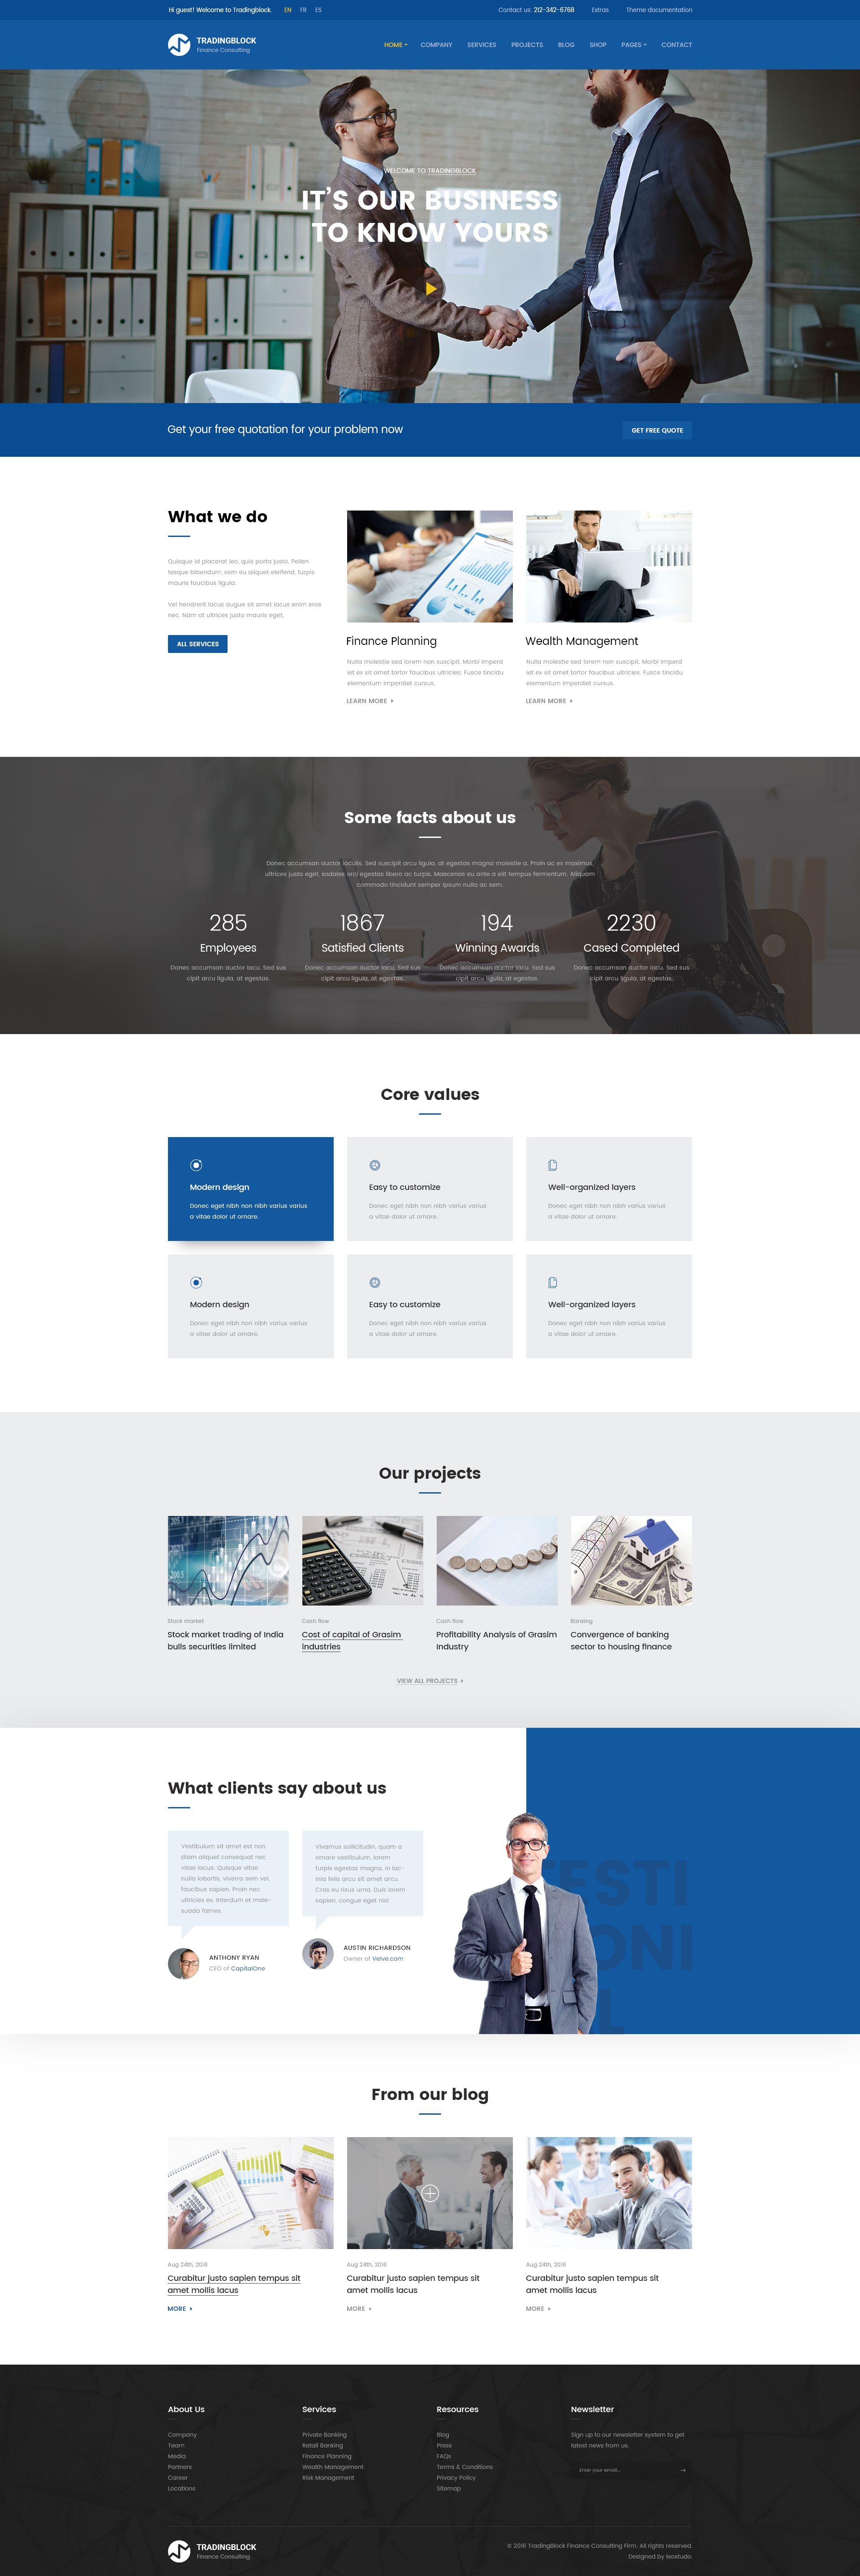 Finance Business Psd Template Tradingblock Business Website Layout Business Web Design Corporate Website Design